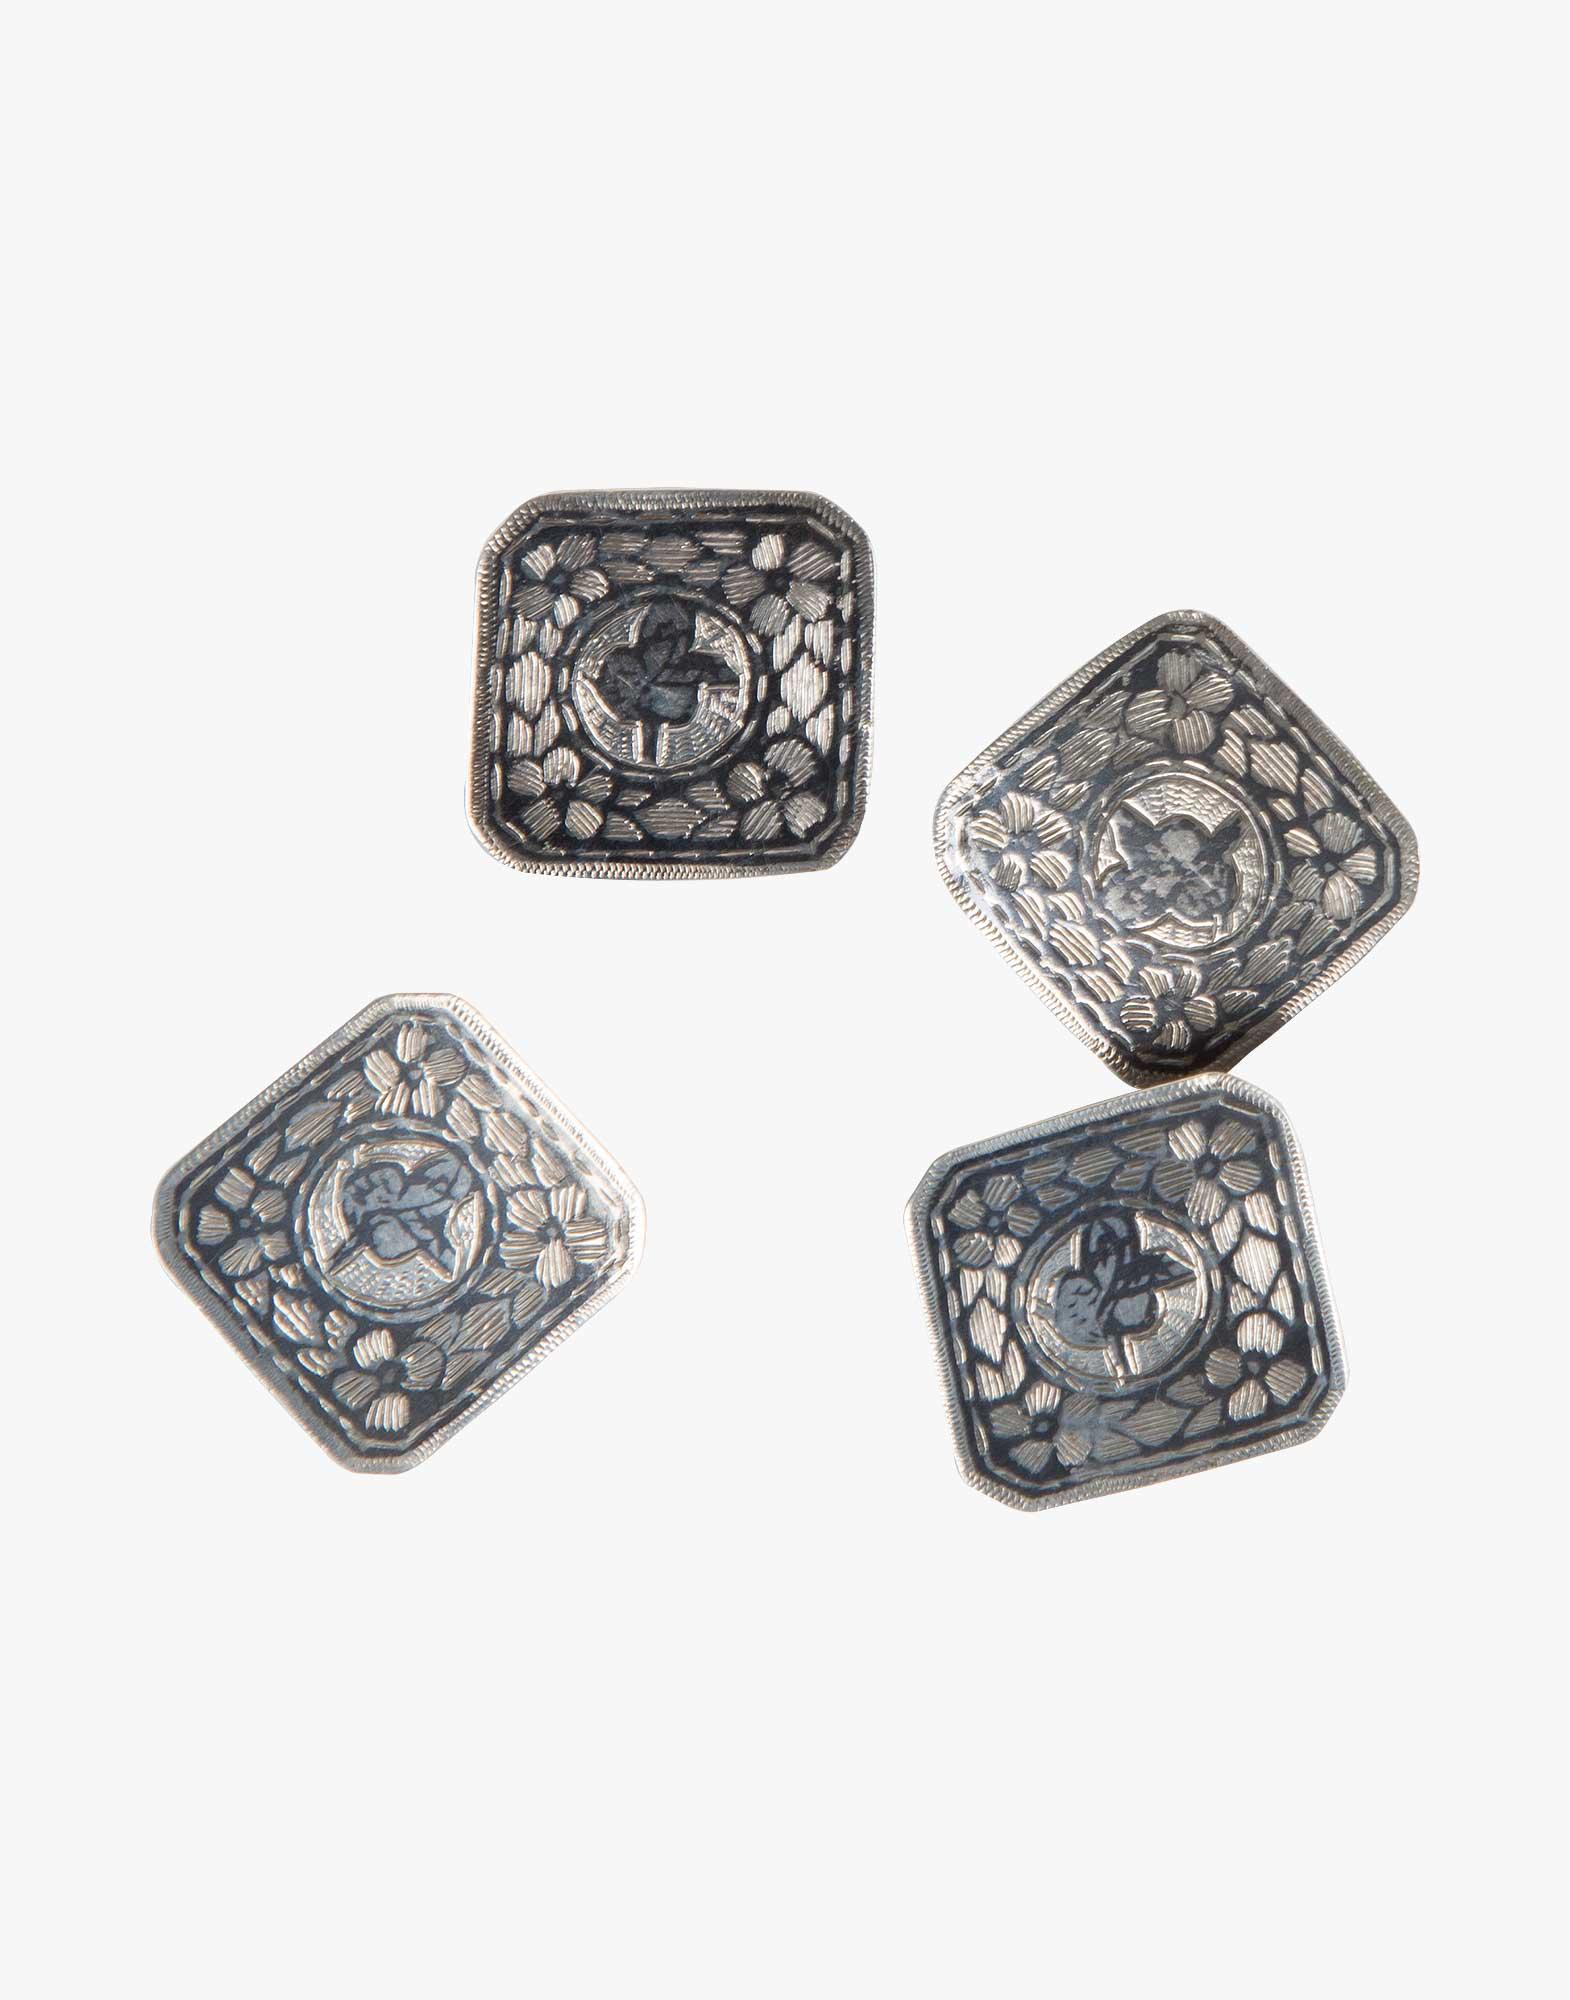 Antique Ottoman Silver Buttons